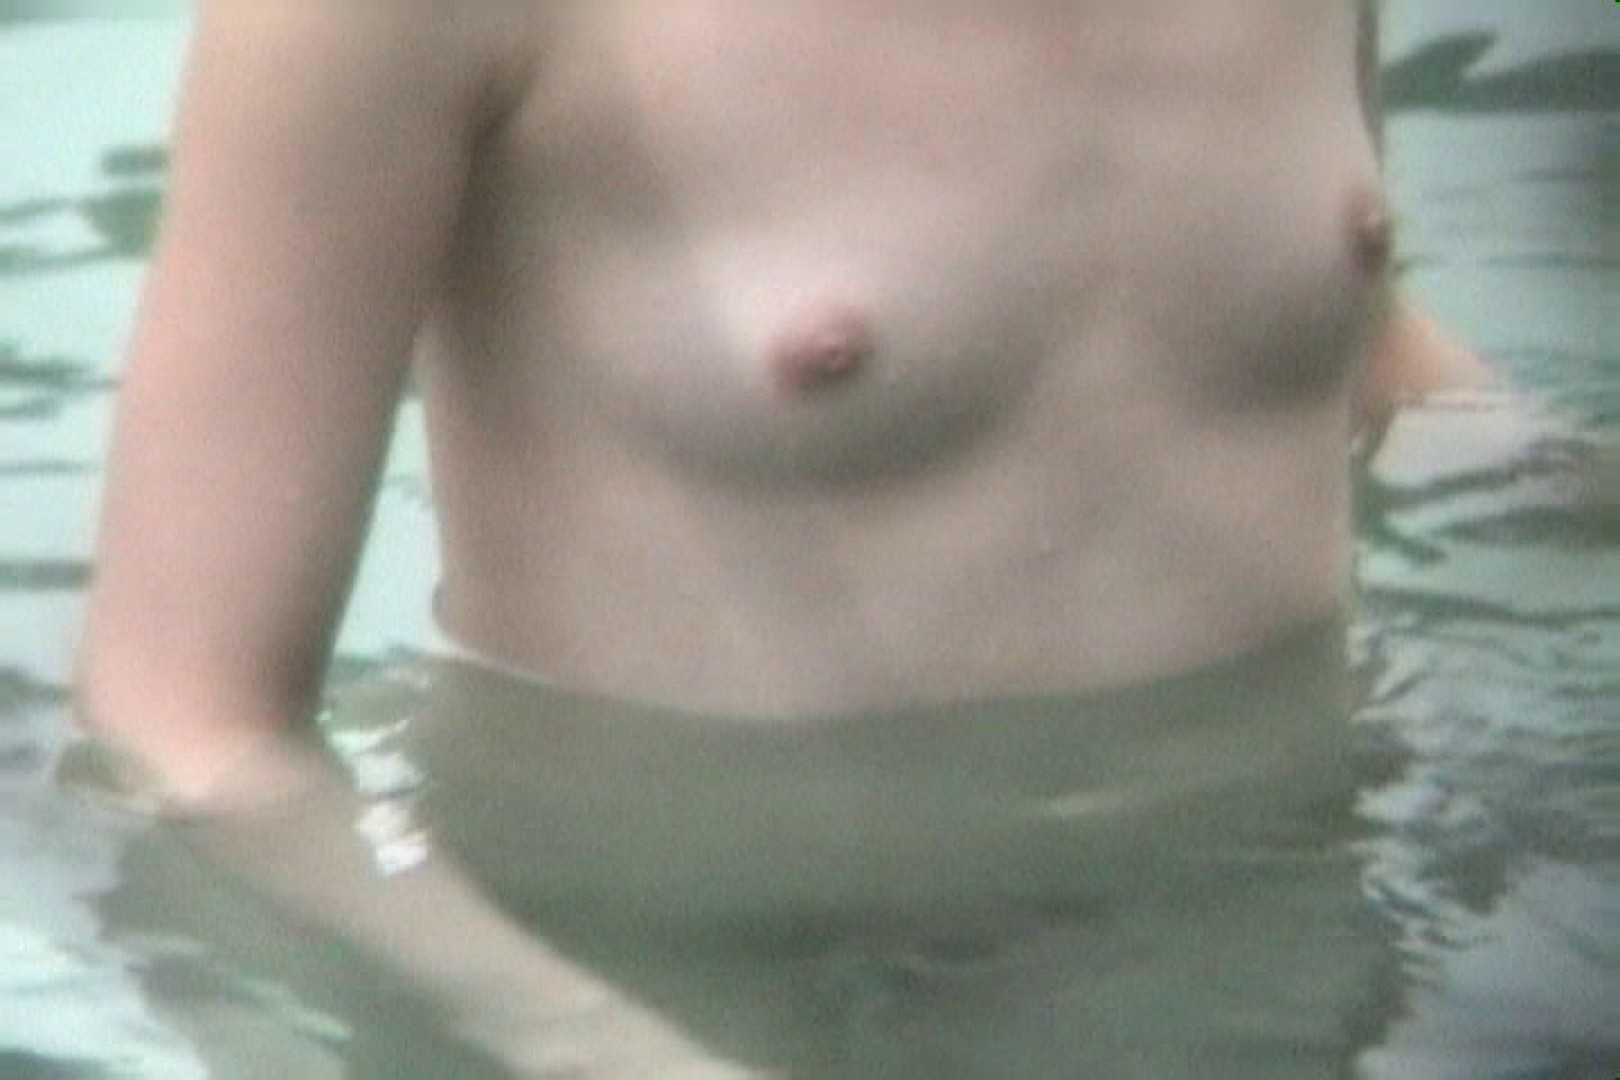 Aquaな露天風呂Vol.71【VIP限定】 盗撮 のぞき動画画像 107画像 89